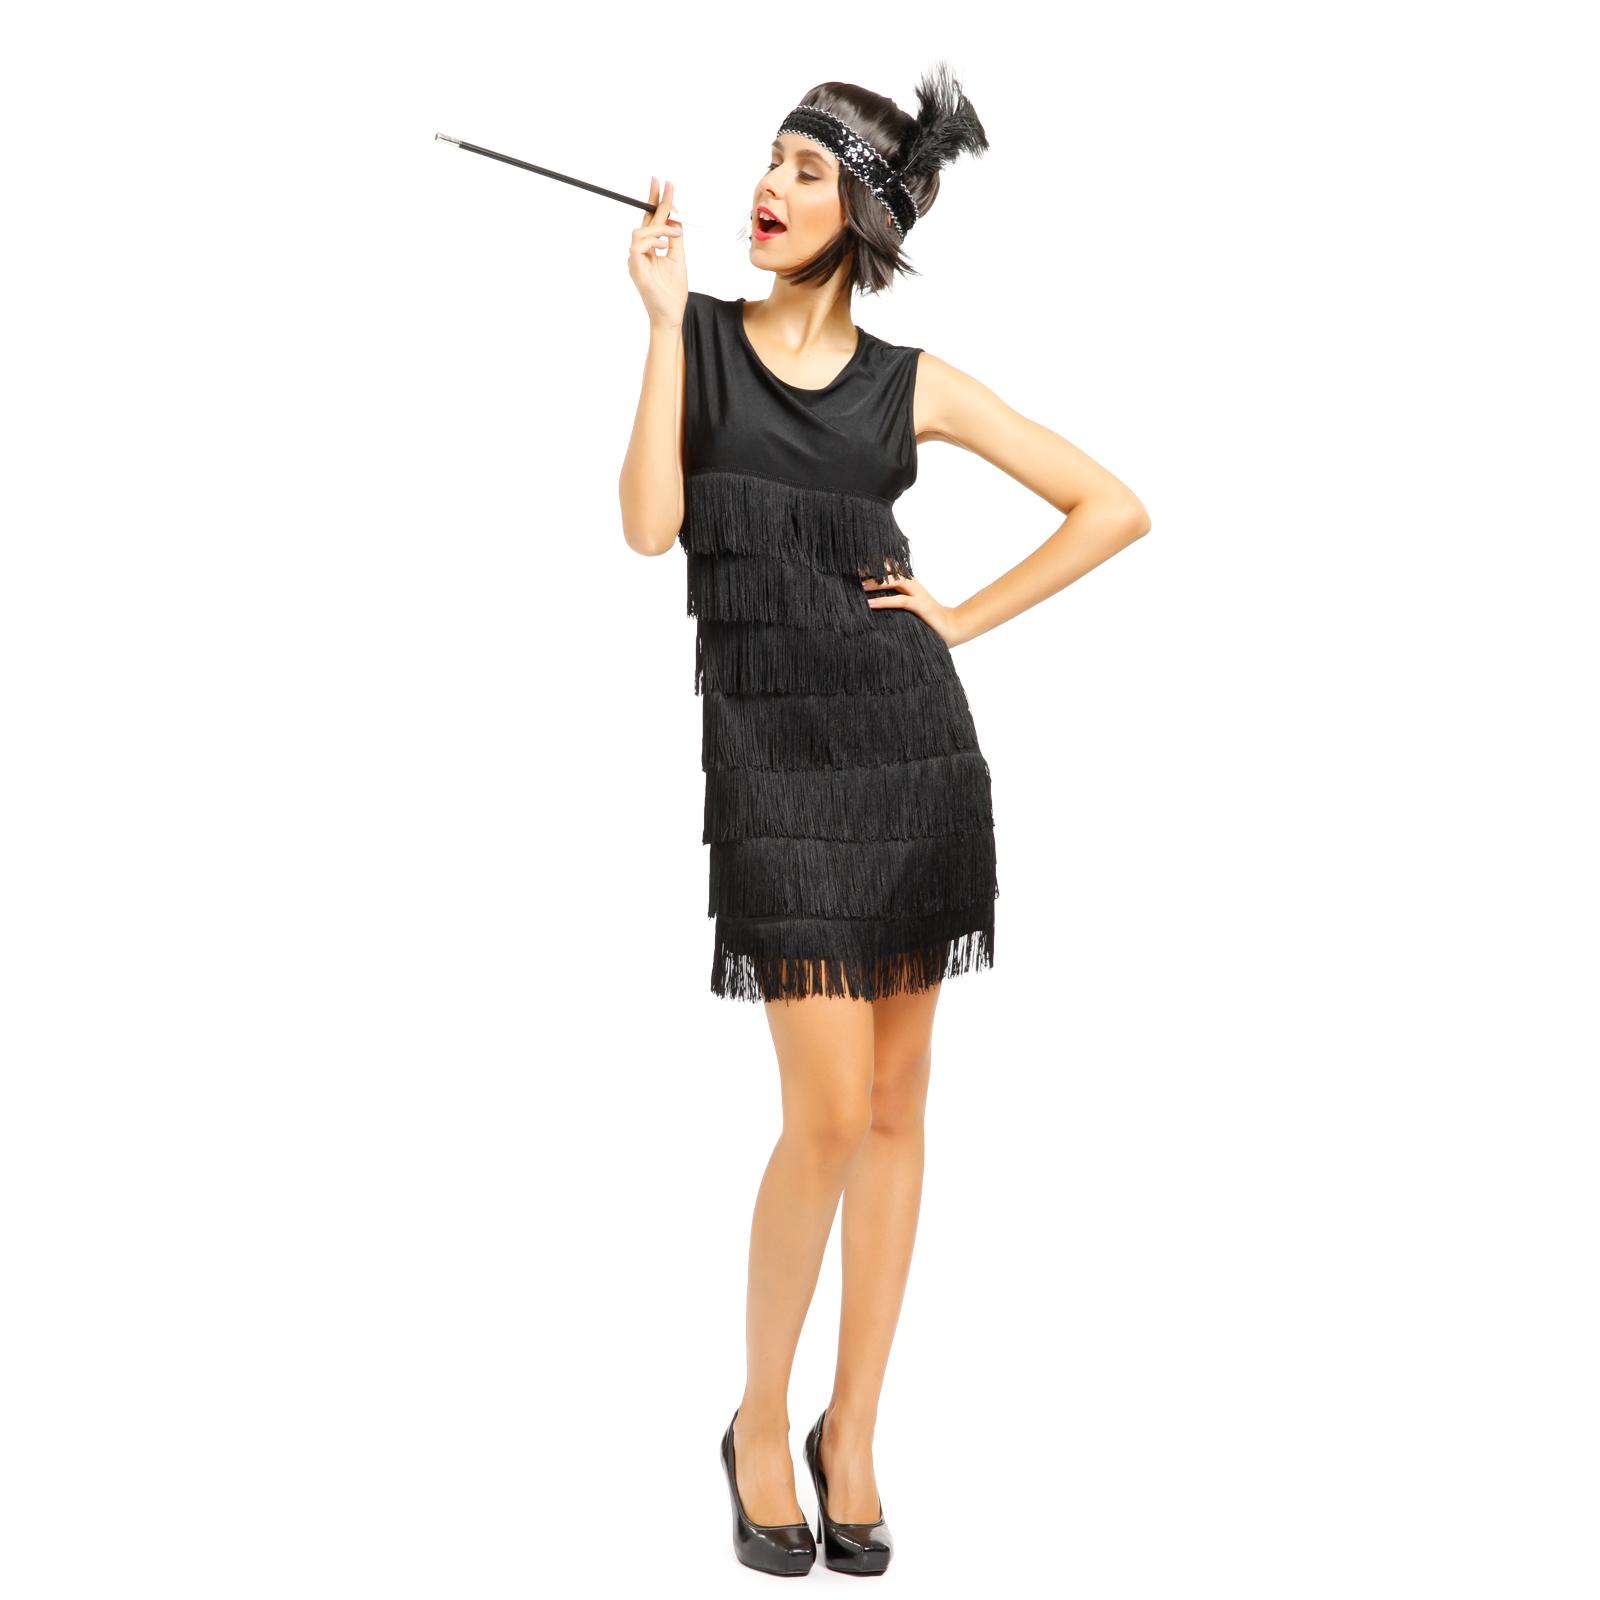 Atemberaubend Gatsby Partykleid Ideen Ideen - Brautkleider Ideen ...